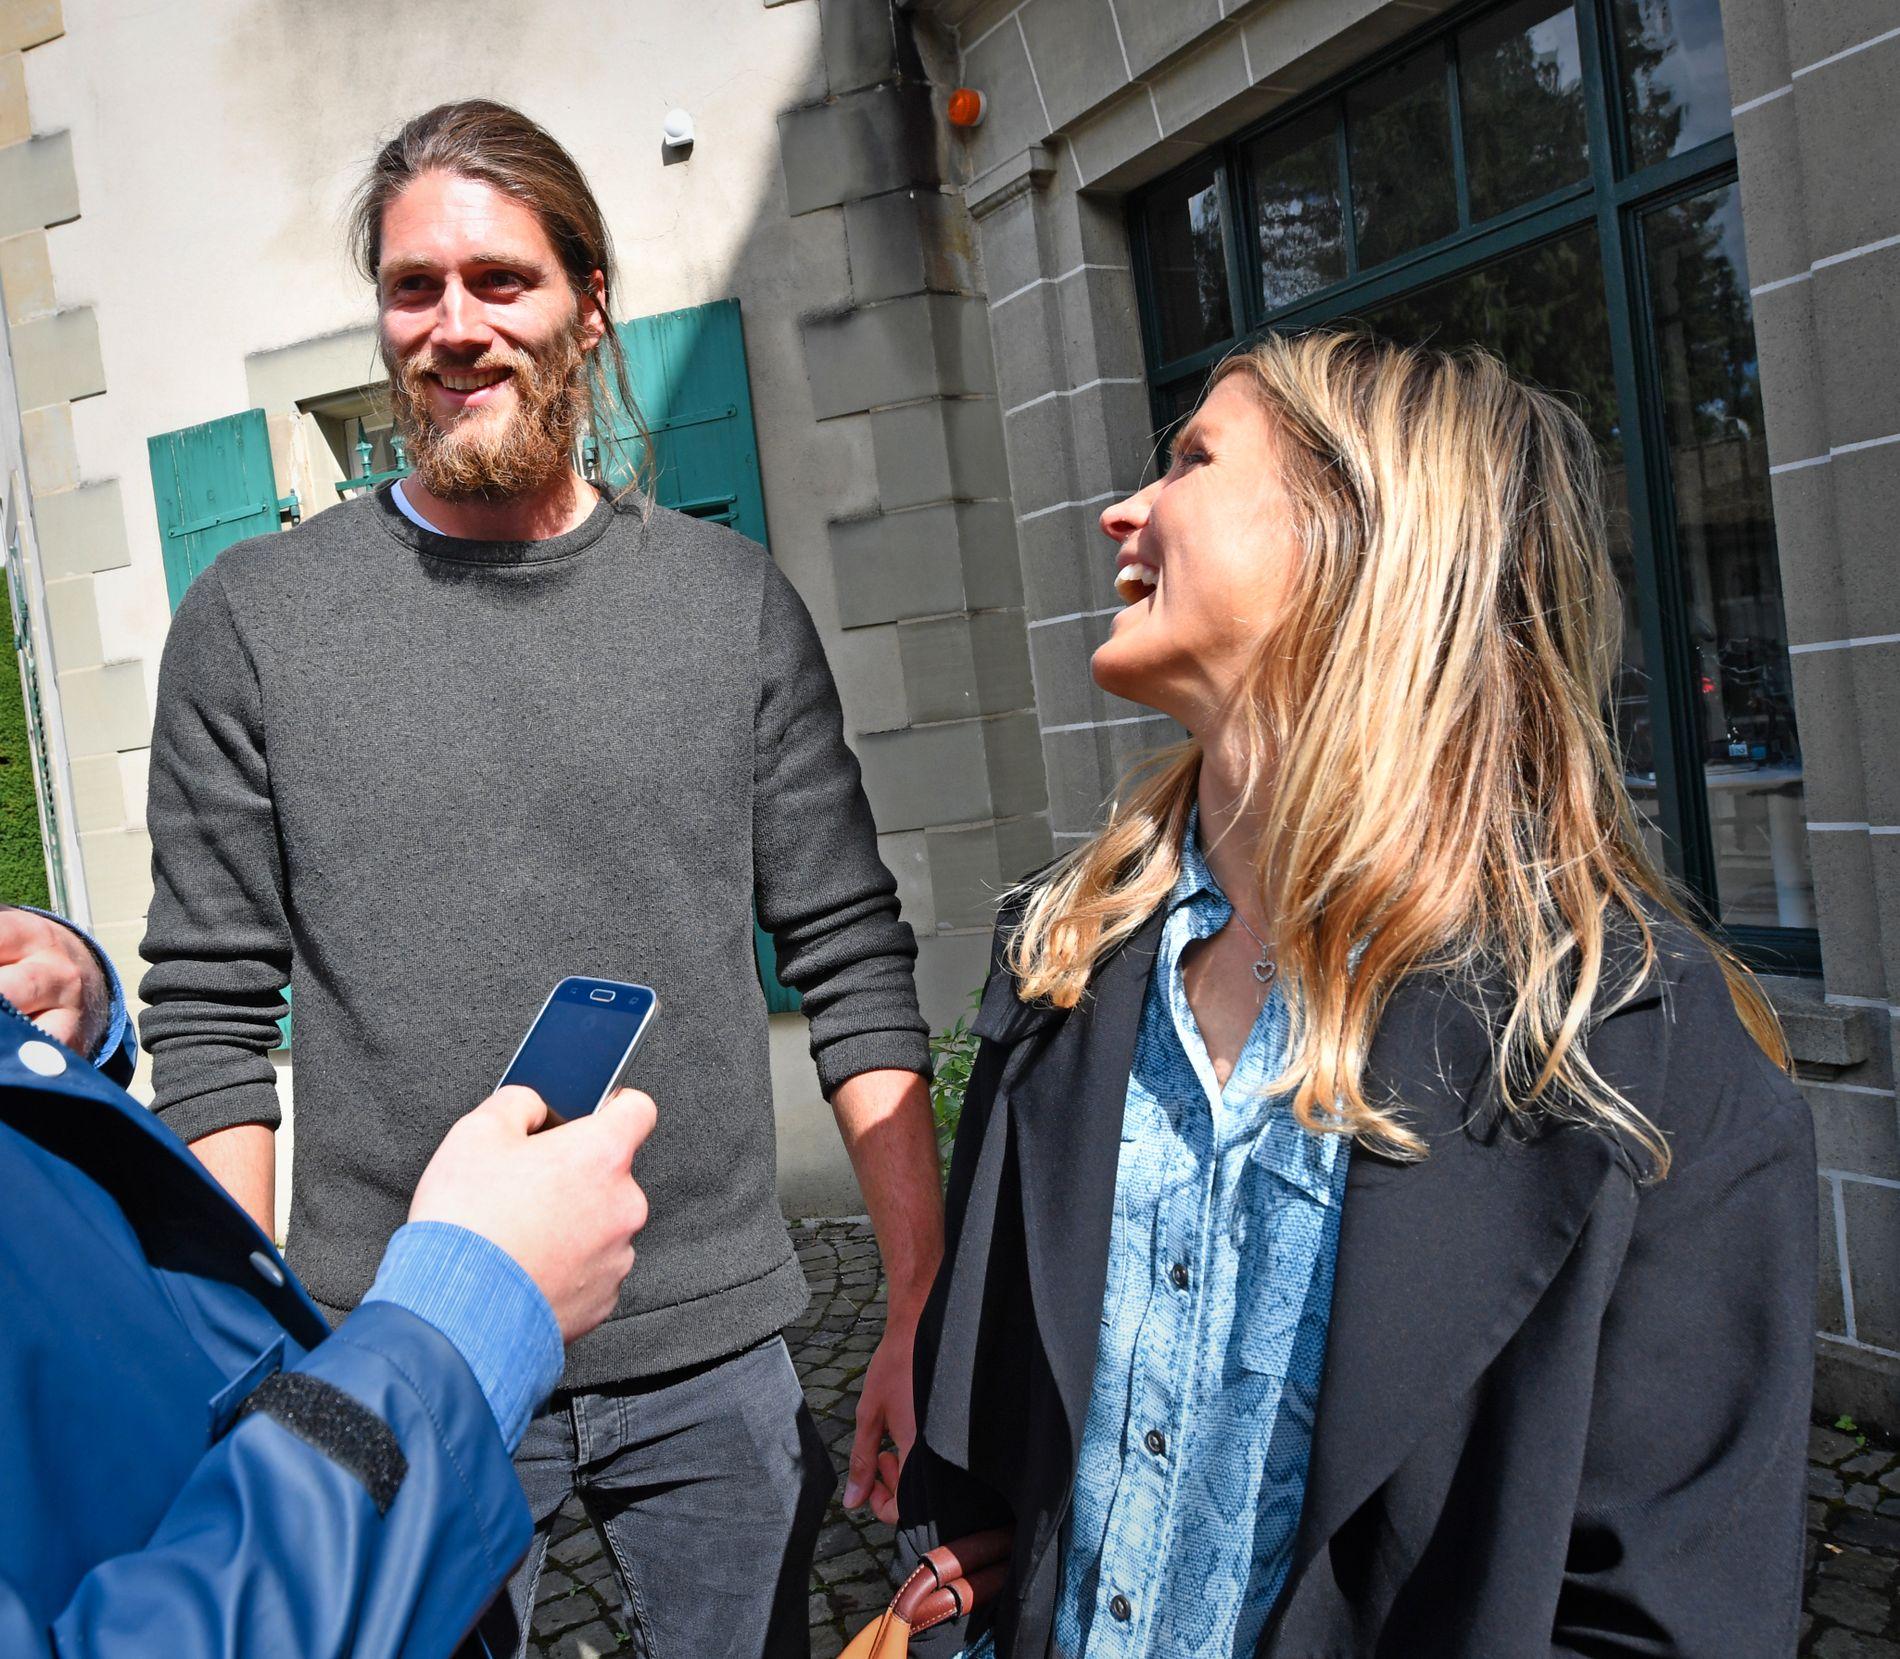 «BAUTA»: Therese Johaug karakteriserte på torsdagens pressekonferanse sin kjæresten Nils Jakob Hoff som en «bauta». Her er de fotografert etter høringen i CAS-domstolen.